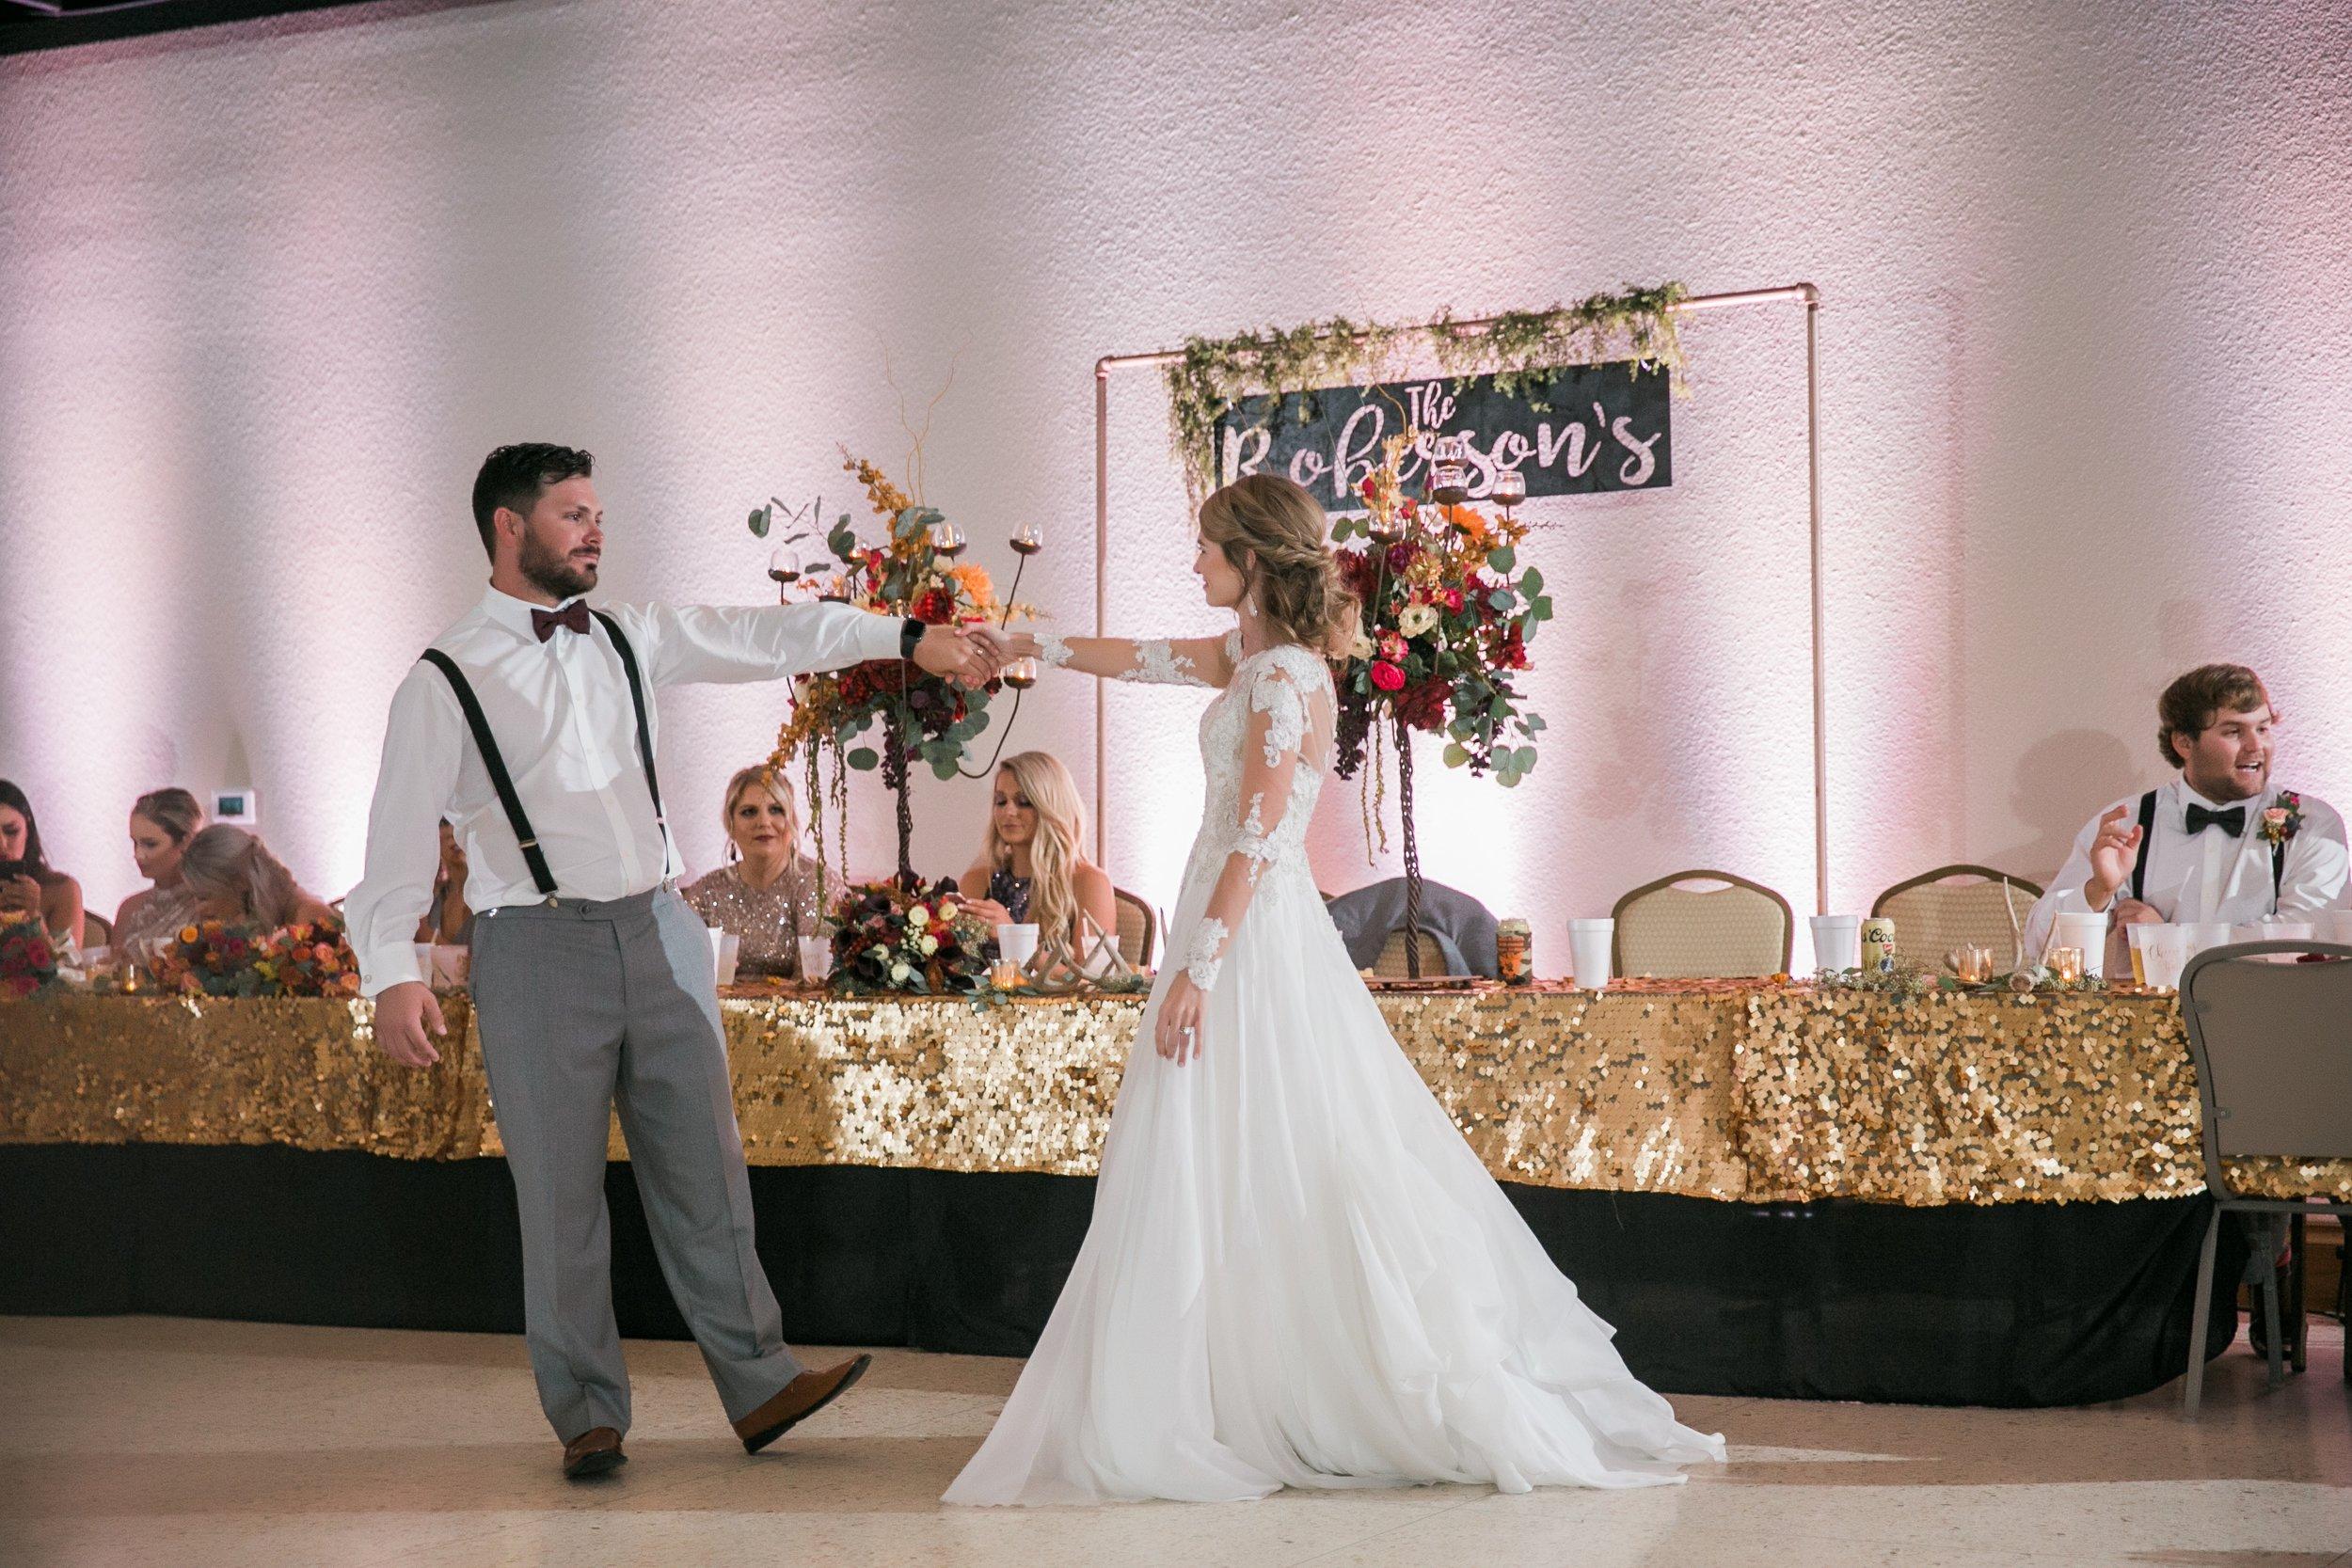 Roberson-Wedding-The-Forum-Lauren-Pinson-Wedding-Photography-Wichita-Falls-Texas-081.jpg